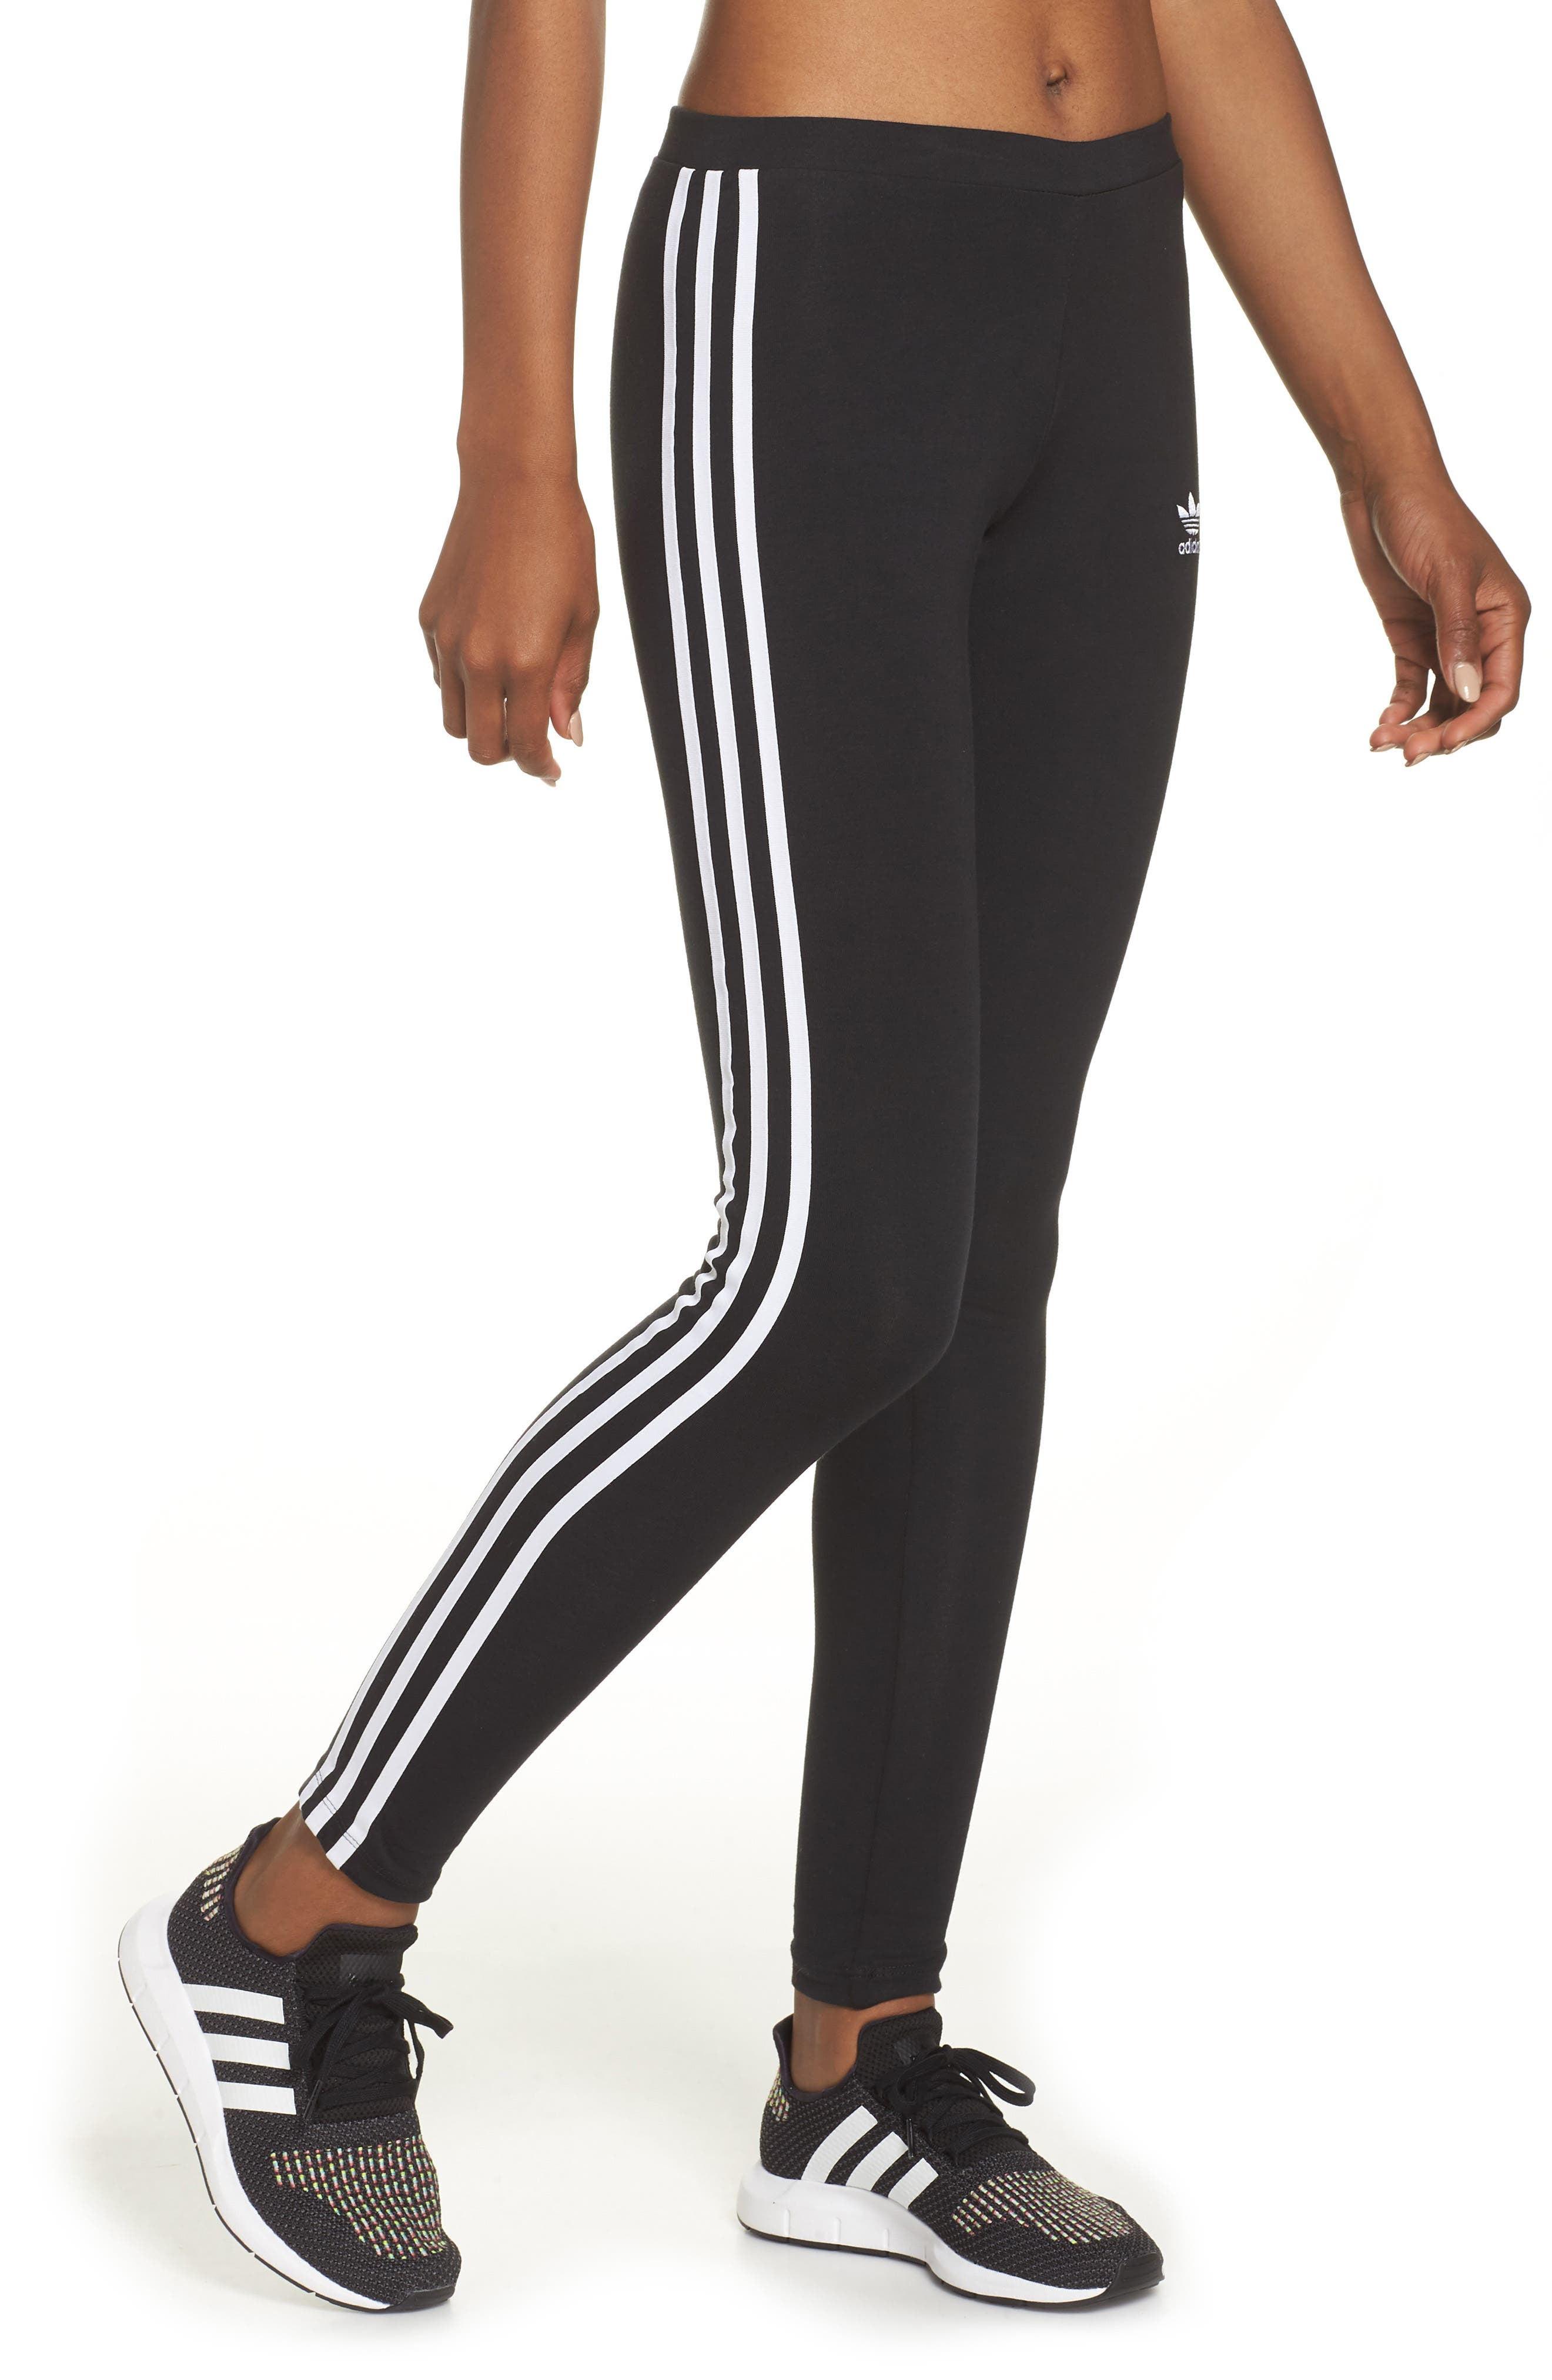 3-Stripes Tights,                         Main,                         color, Black